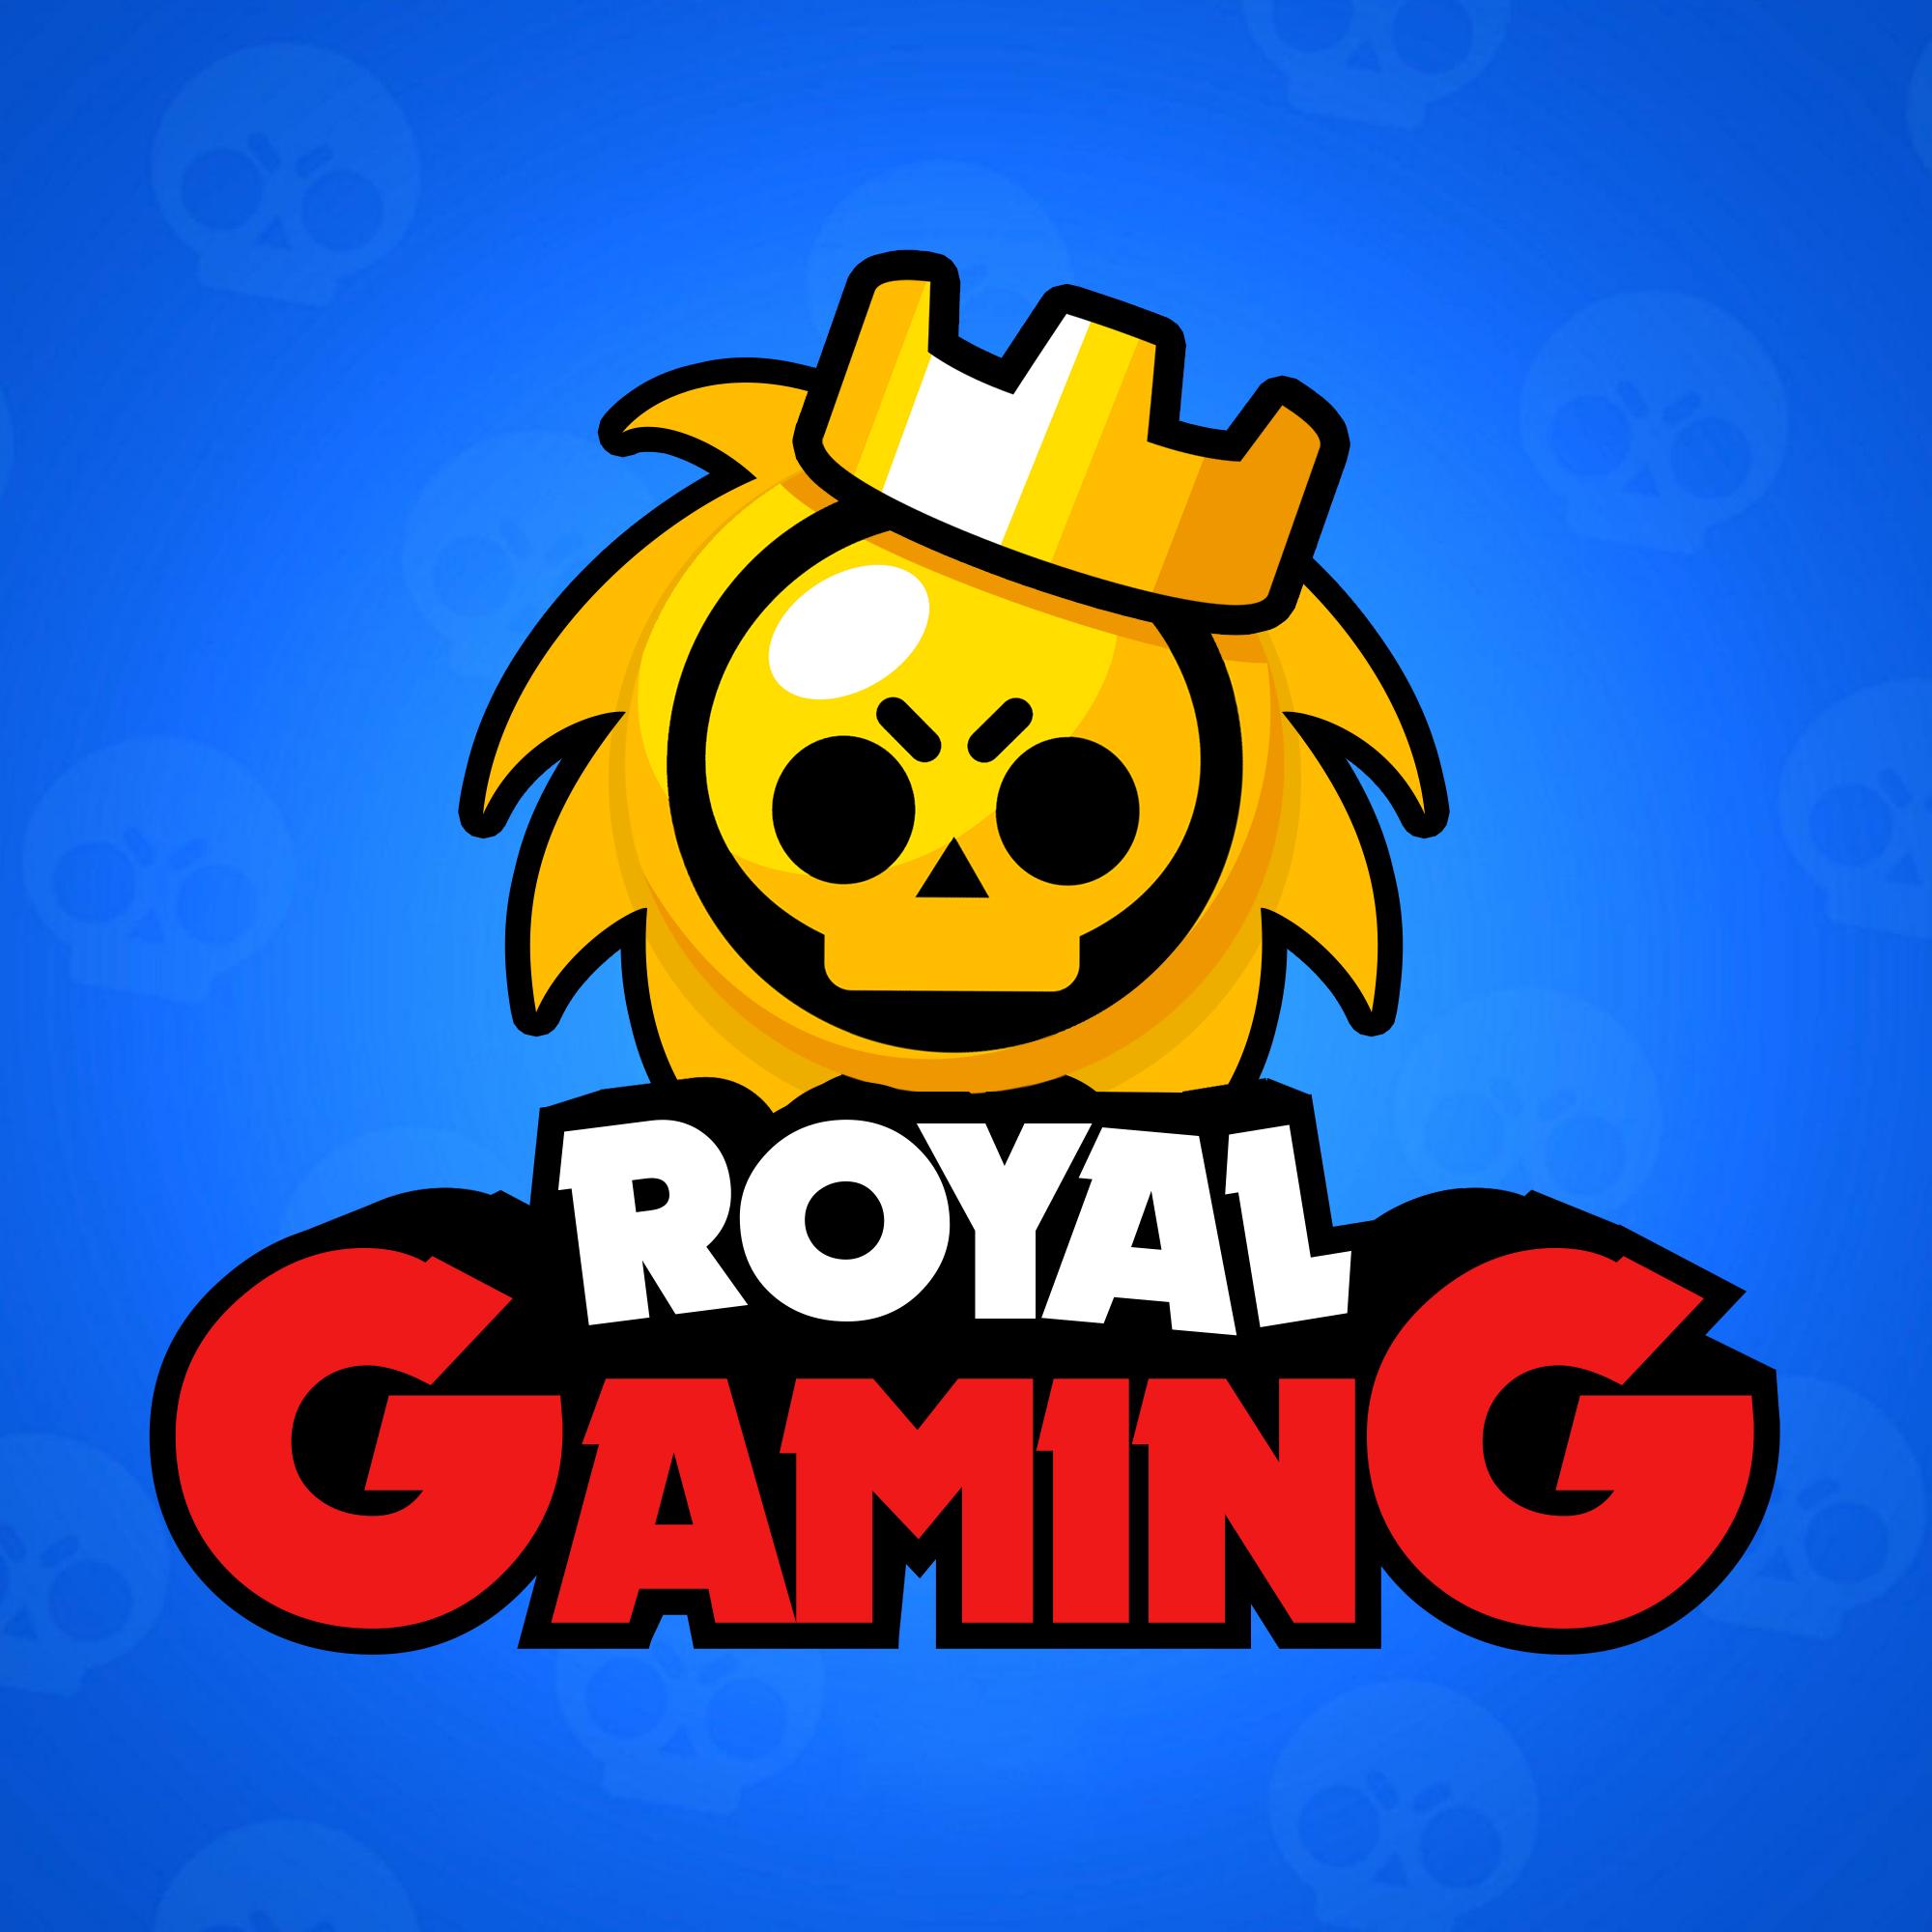 Brawl Stars Tournament Royal Gaming G